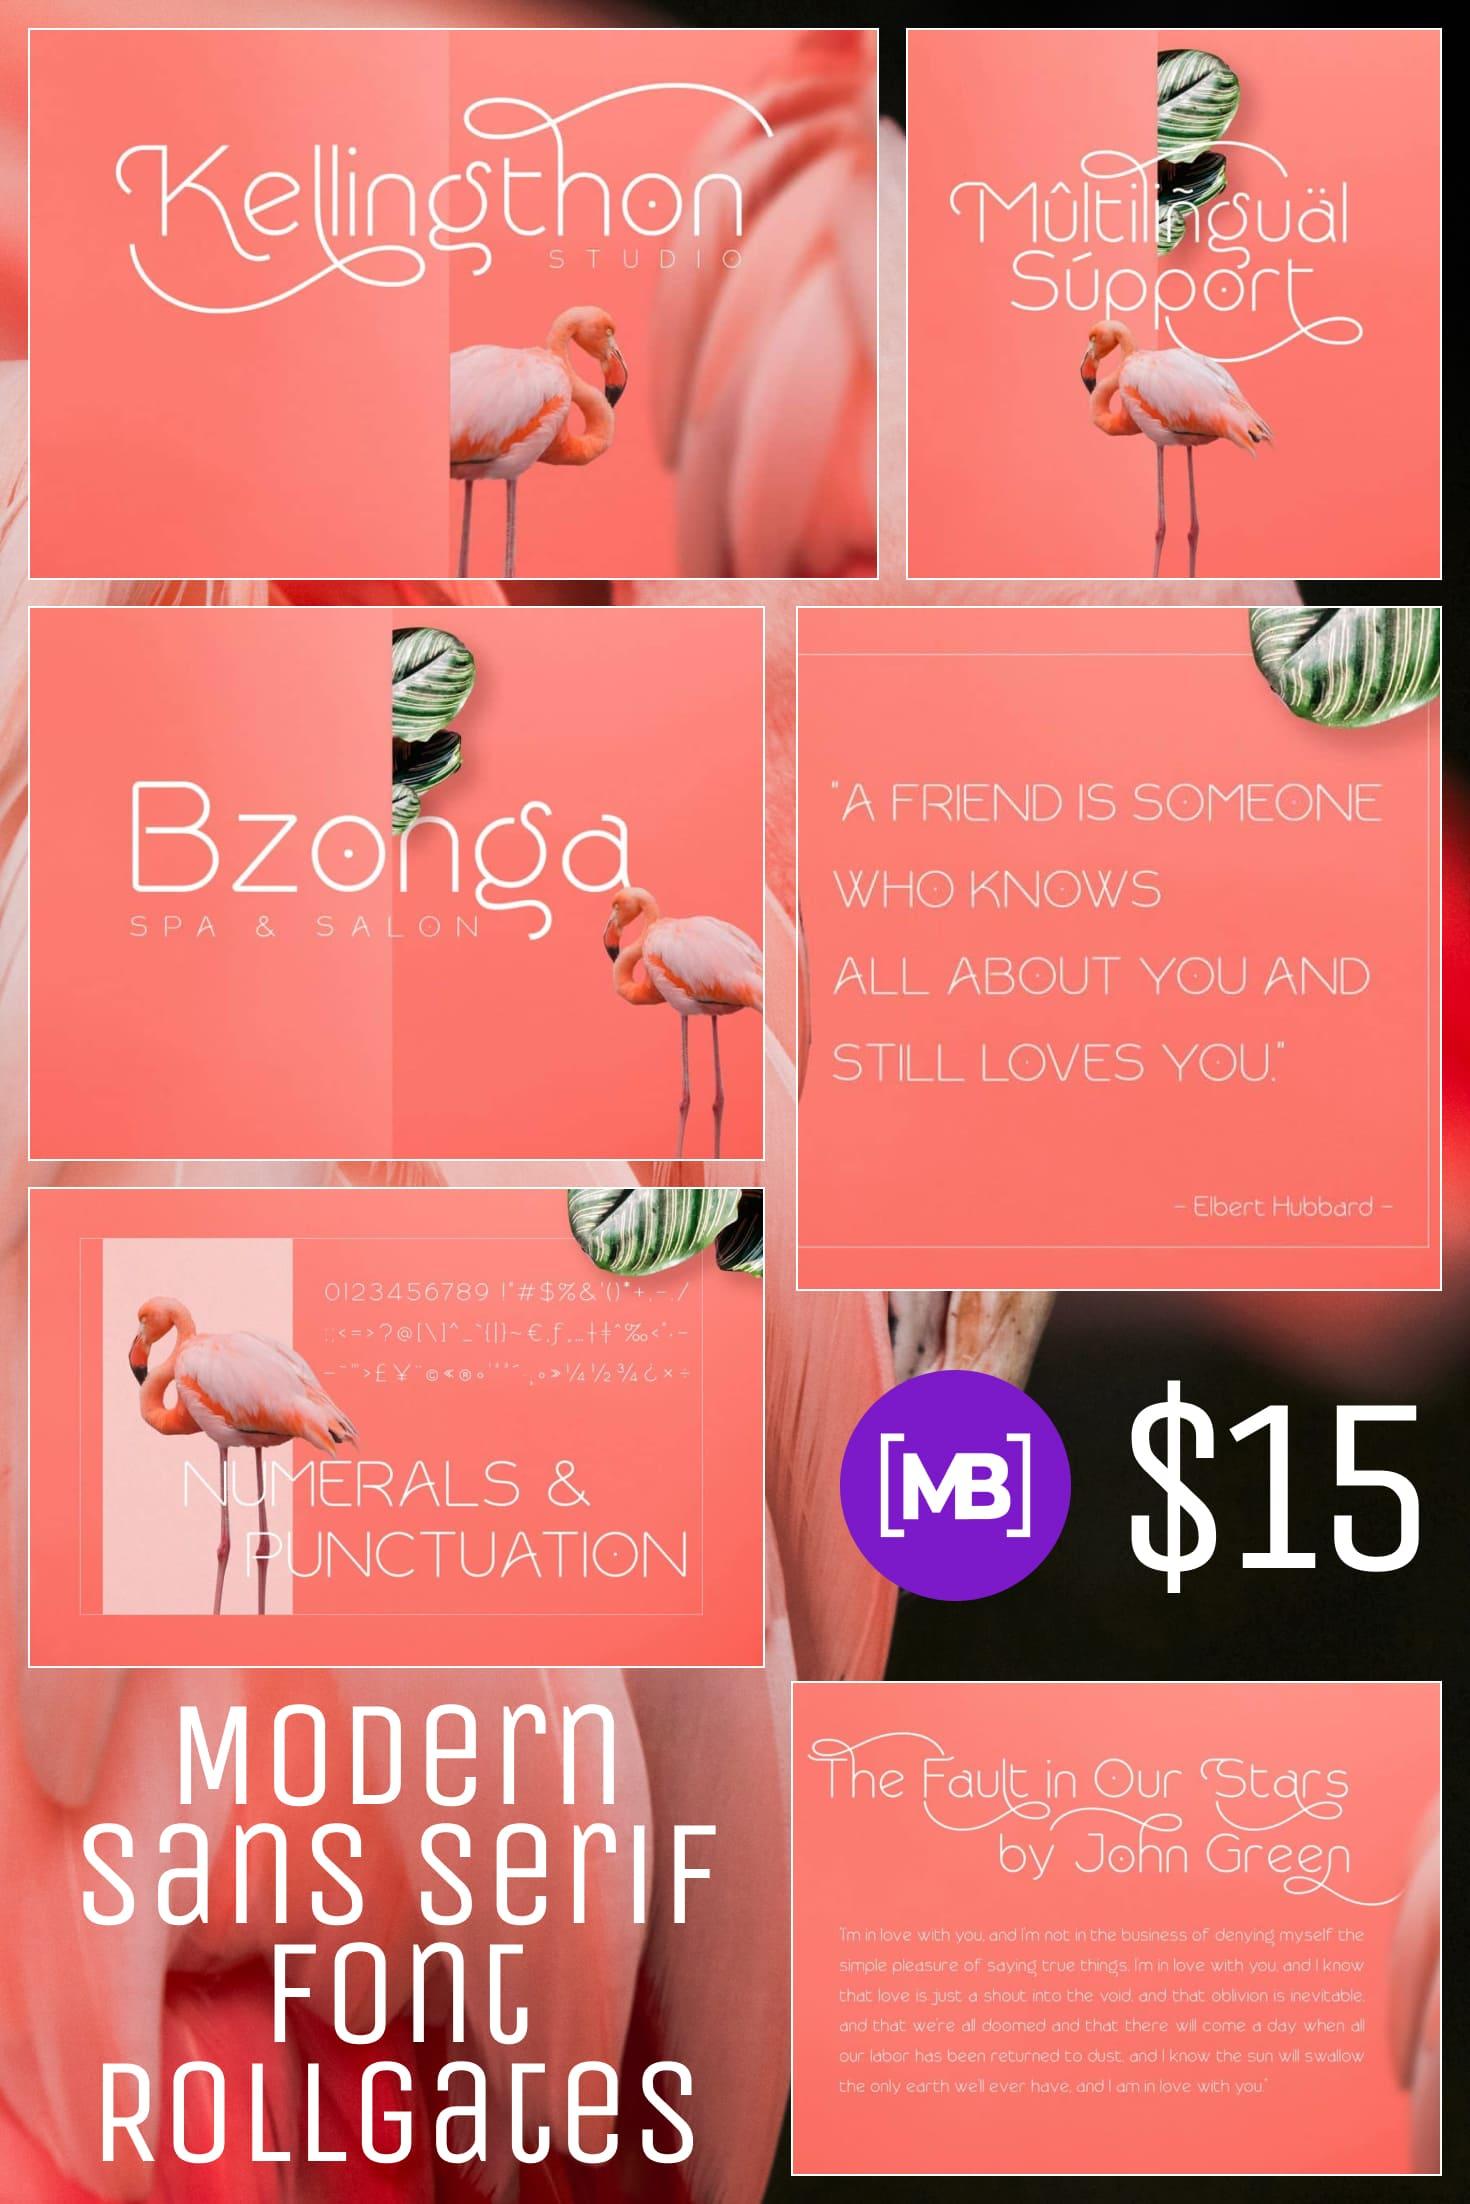 Pinterest Image: Modern Sans Serif Font - Rollgates - $15.